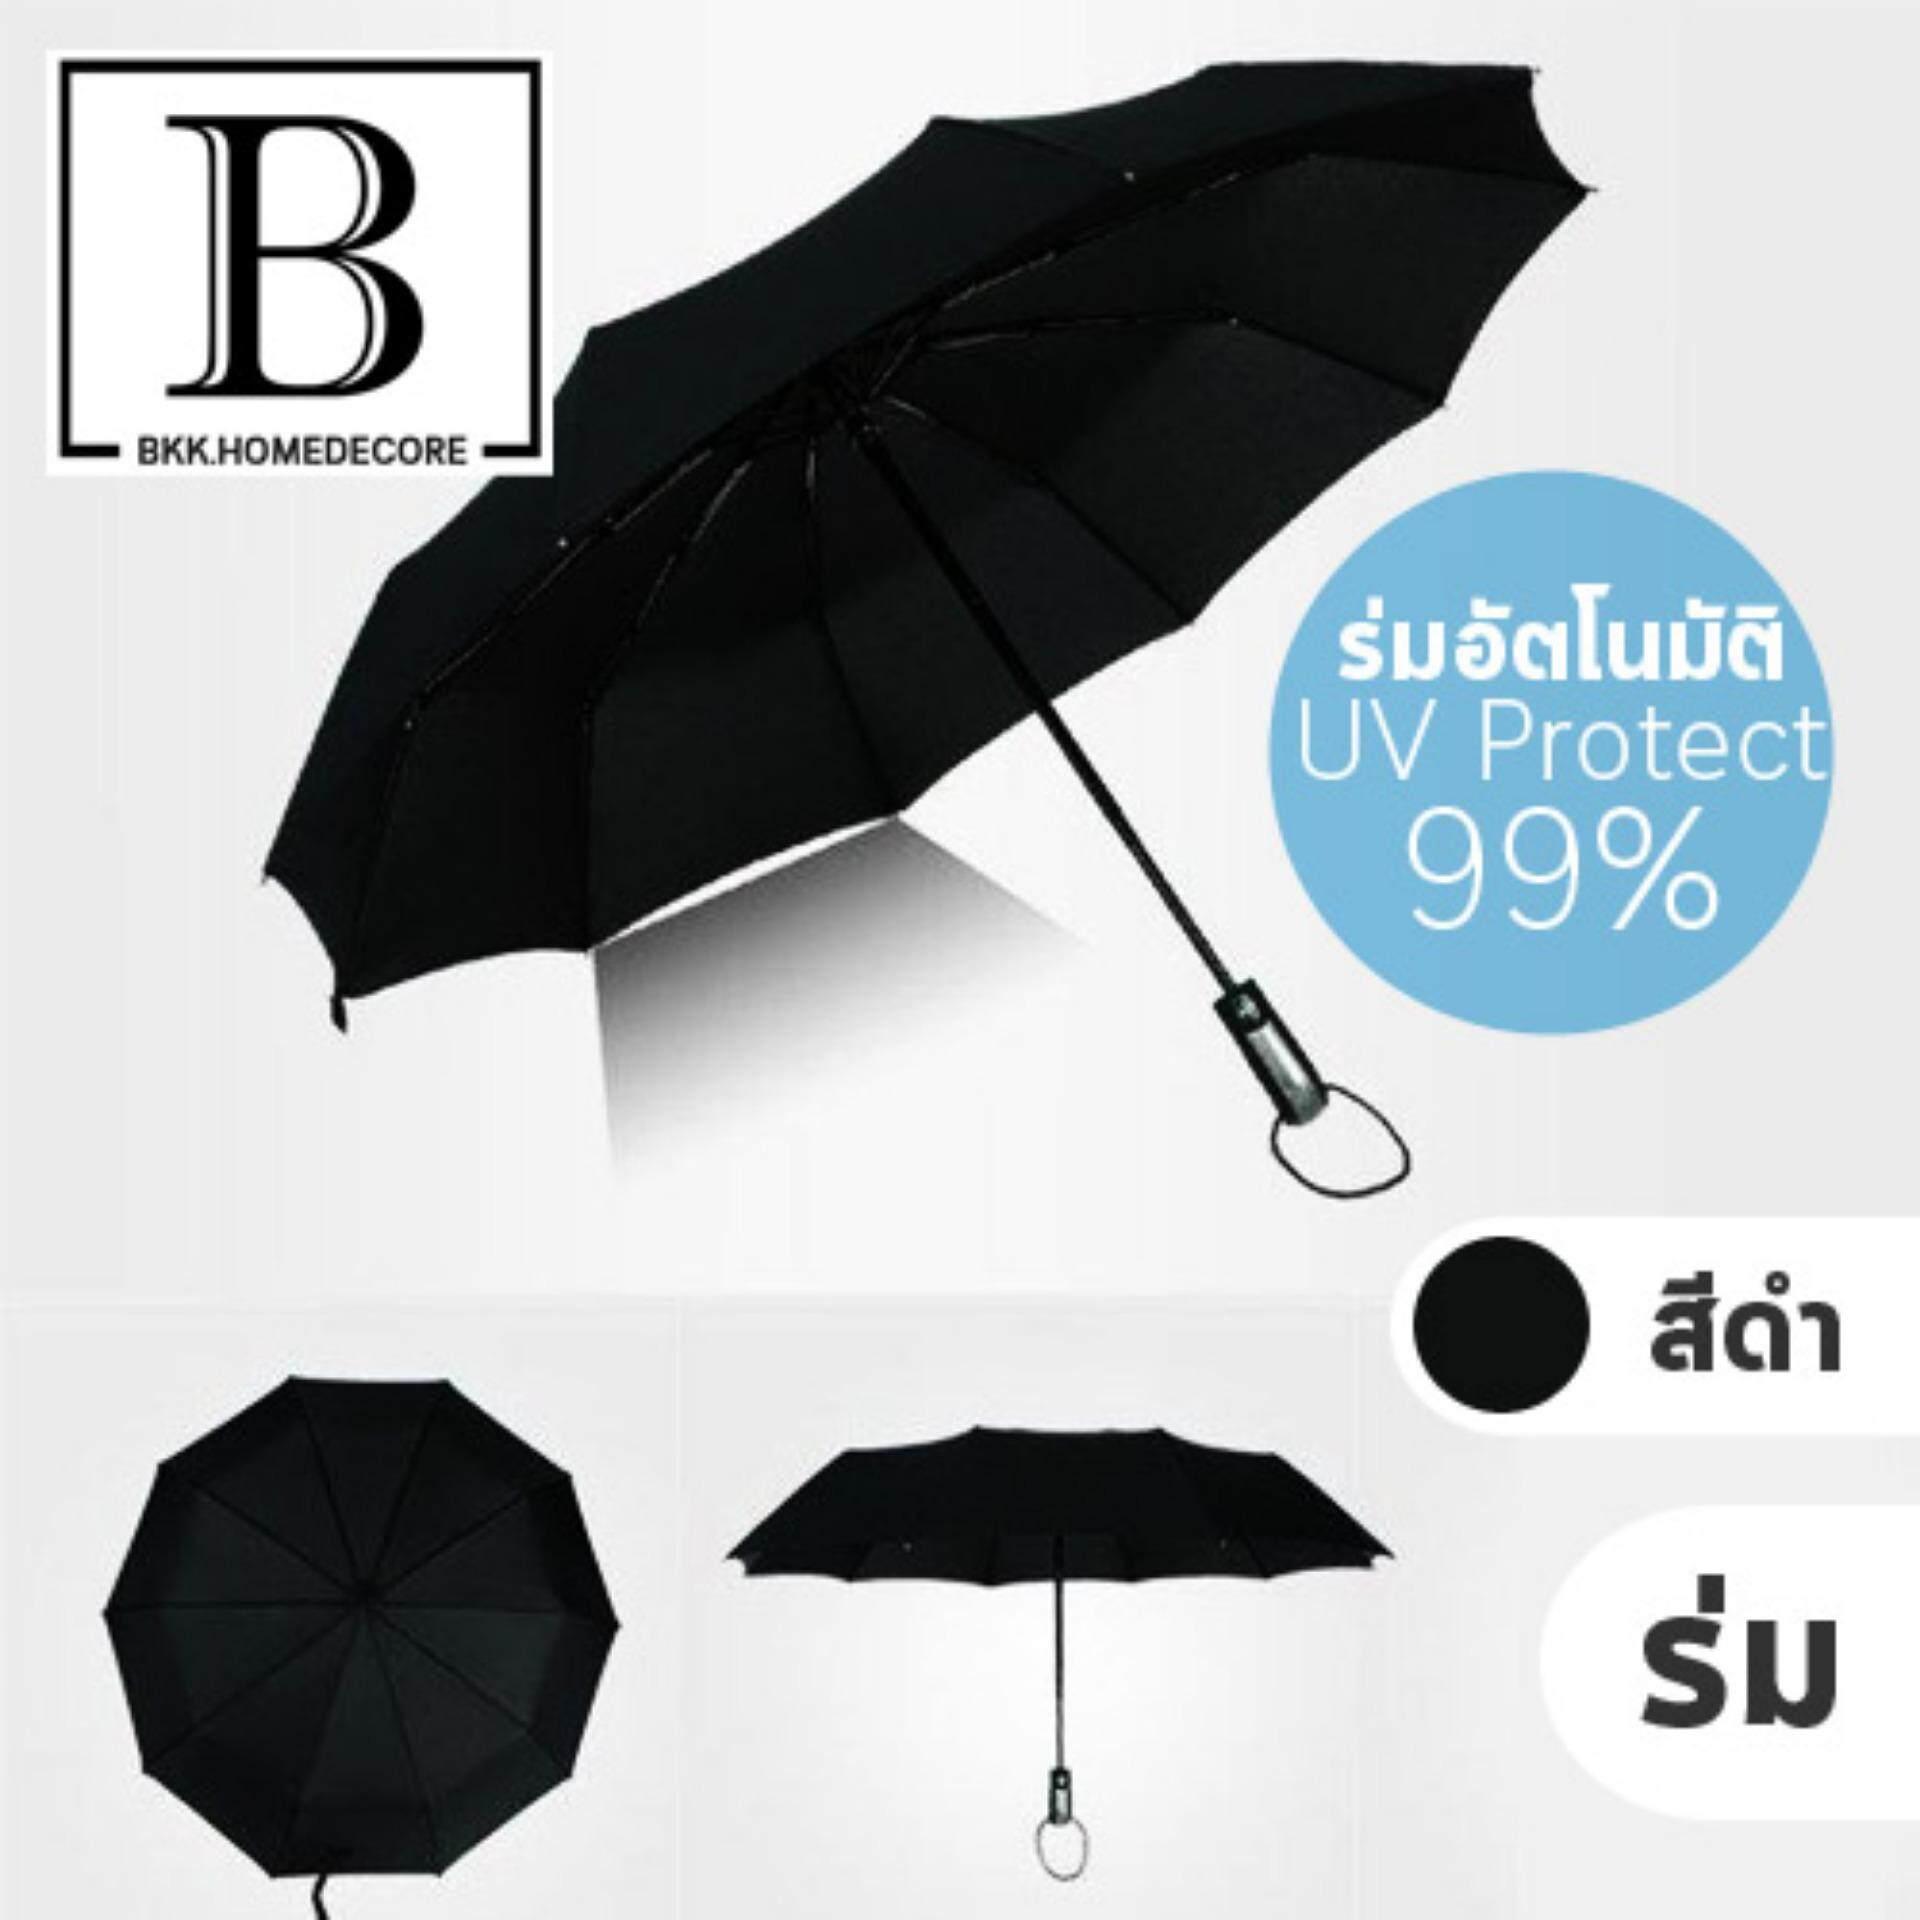 Bkk.home ร่ม ร่มกันฝน กันแดด อัตโนมัติ แบบพับ กันยูวี Uv Protect 99% พกพาสะดวก ( ร่ม ) Bkkhome By Bkk.homedecore.